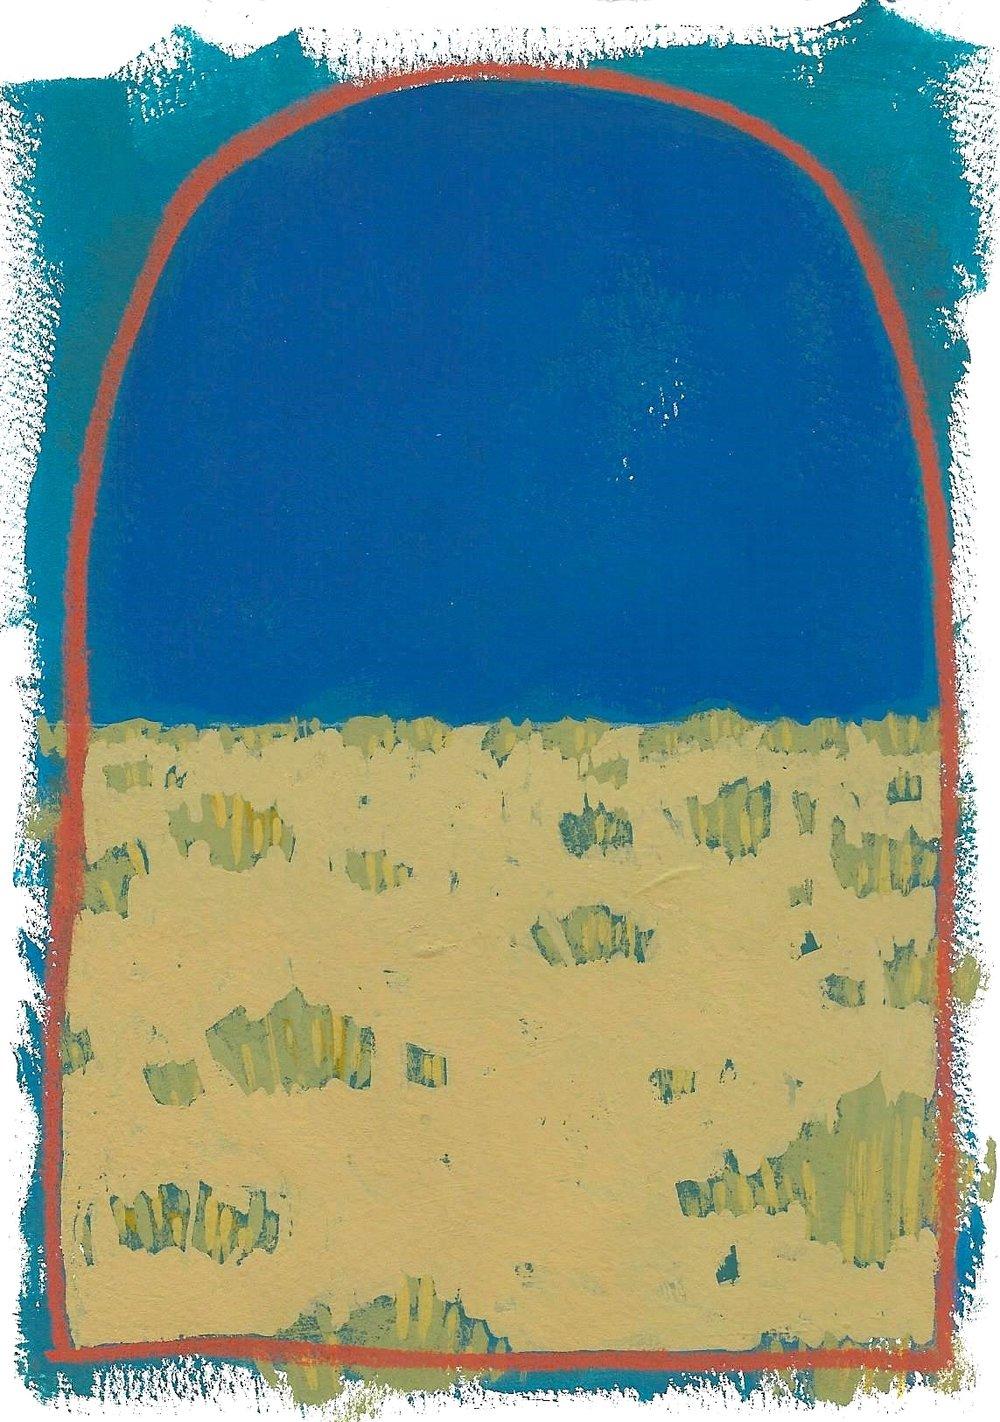 #01 Mini Desert Painting: Crescent Moon